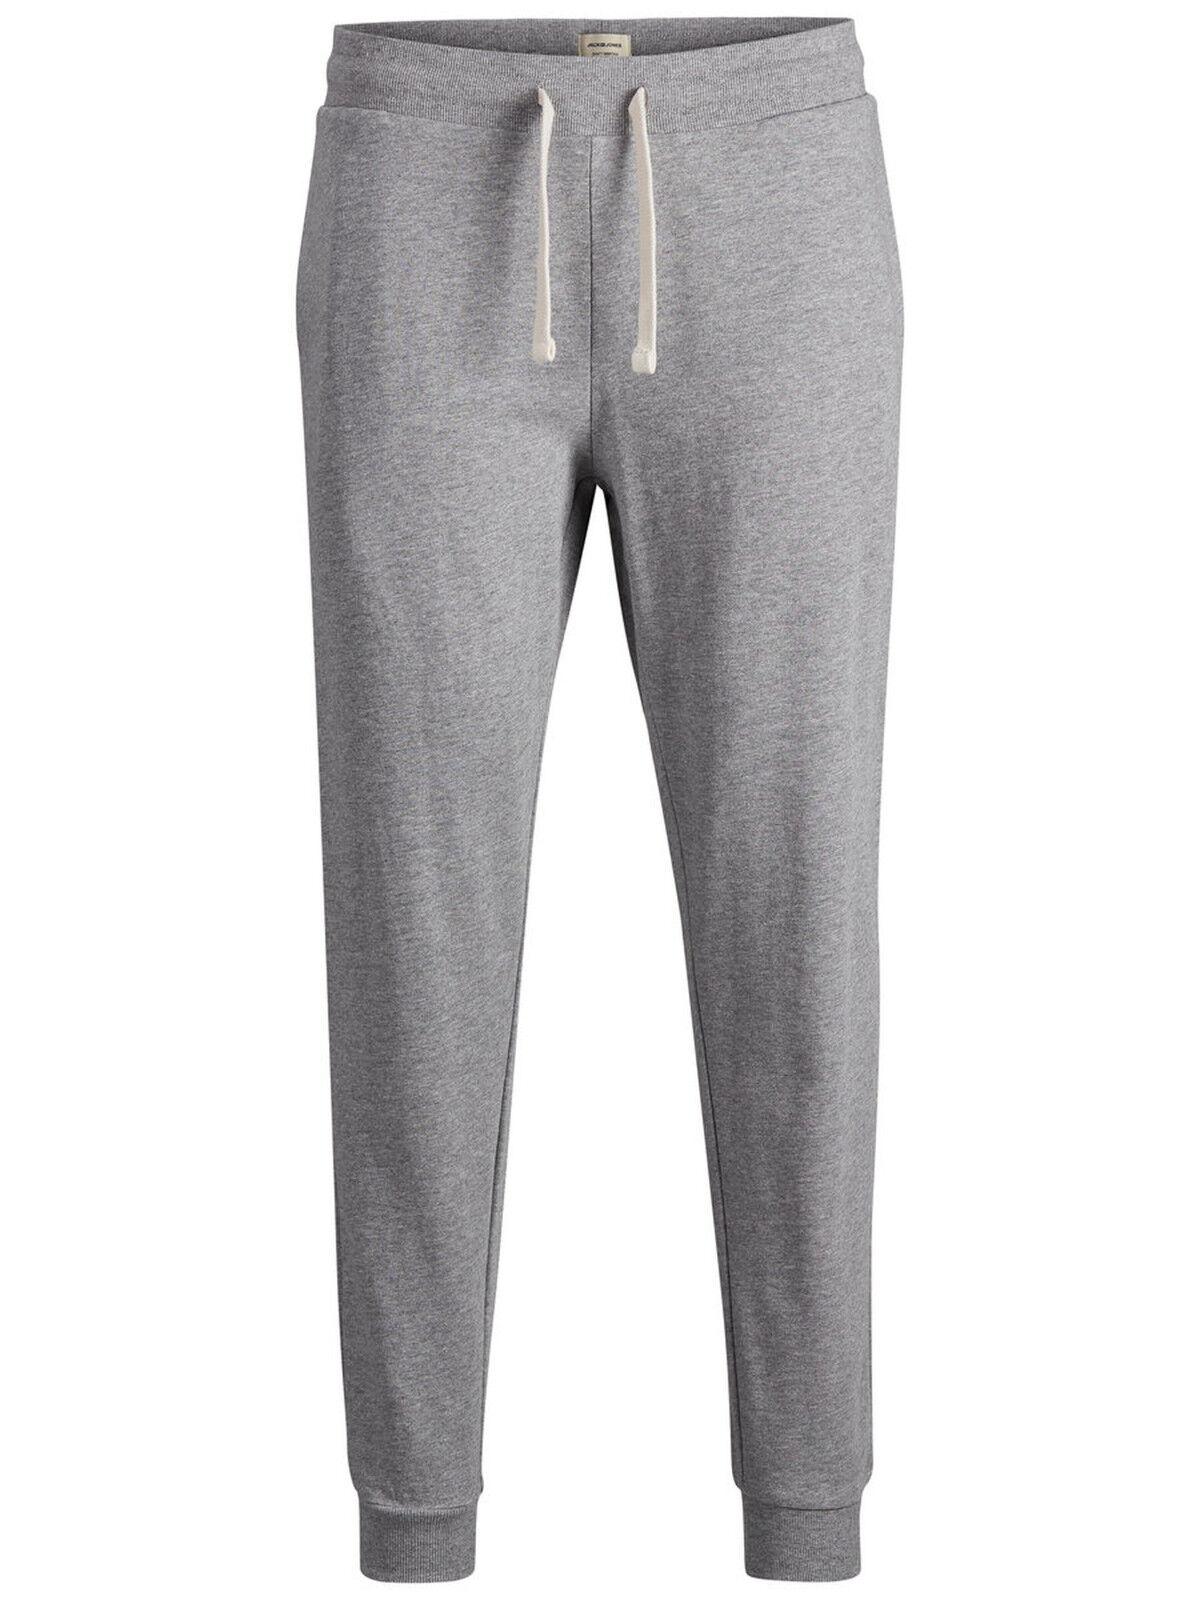 Jack /& Jones Essentials Sweat Pants Mens Casual Gym Fitness Joggers JJEHolmen